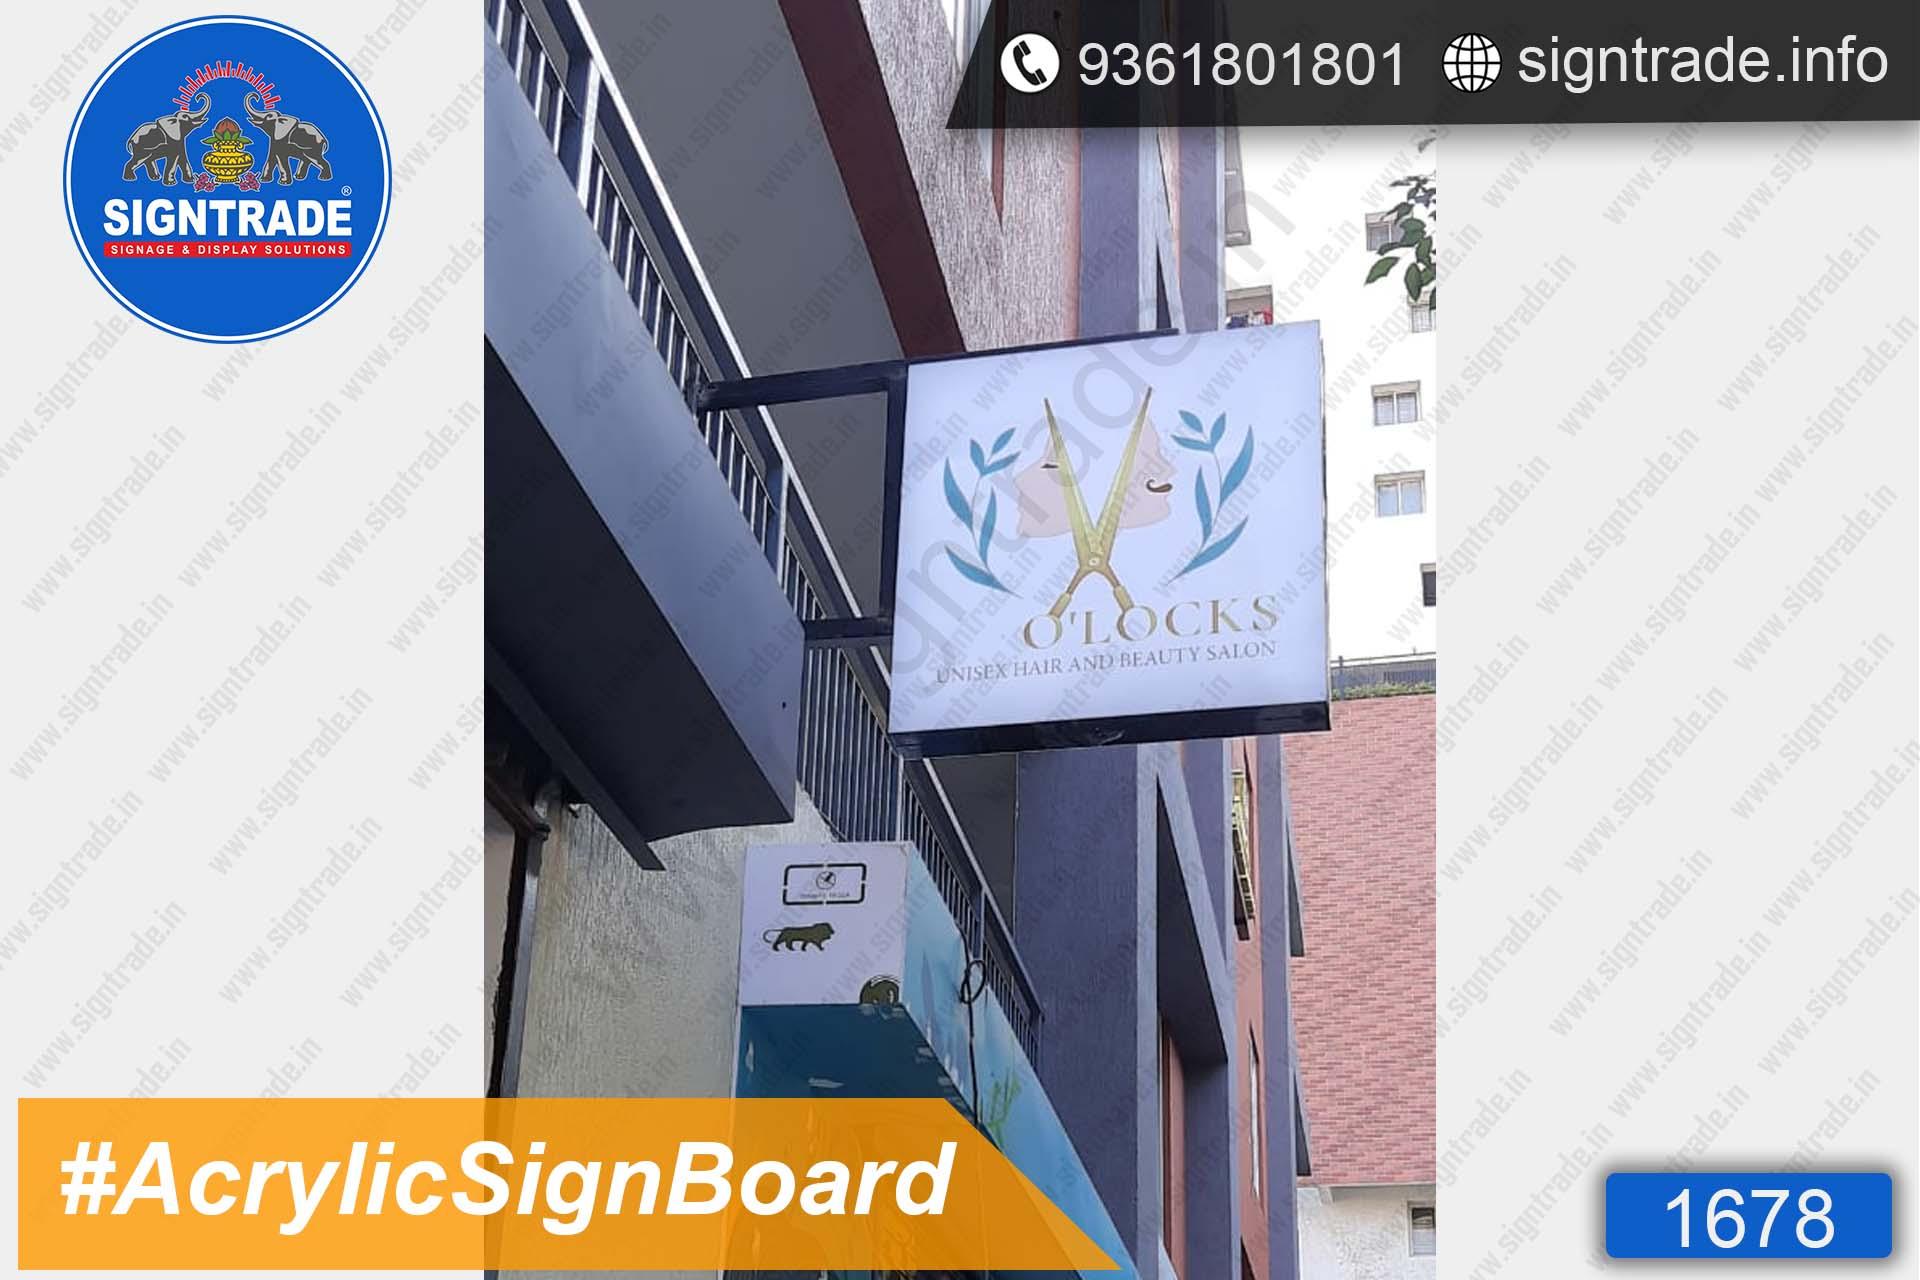 O Locks Unisex Salon and Spa, Chennai - SIGNTRADE - Acrylic LED Sign Board Manufacturers in Chennai